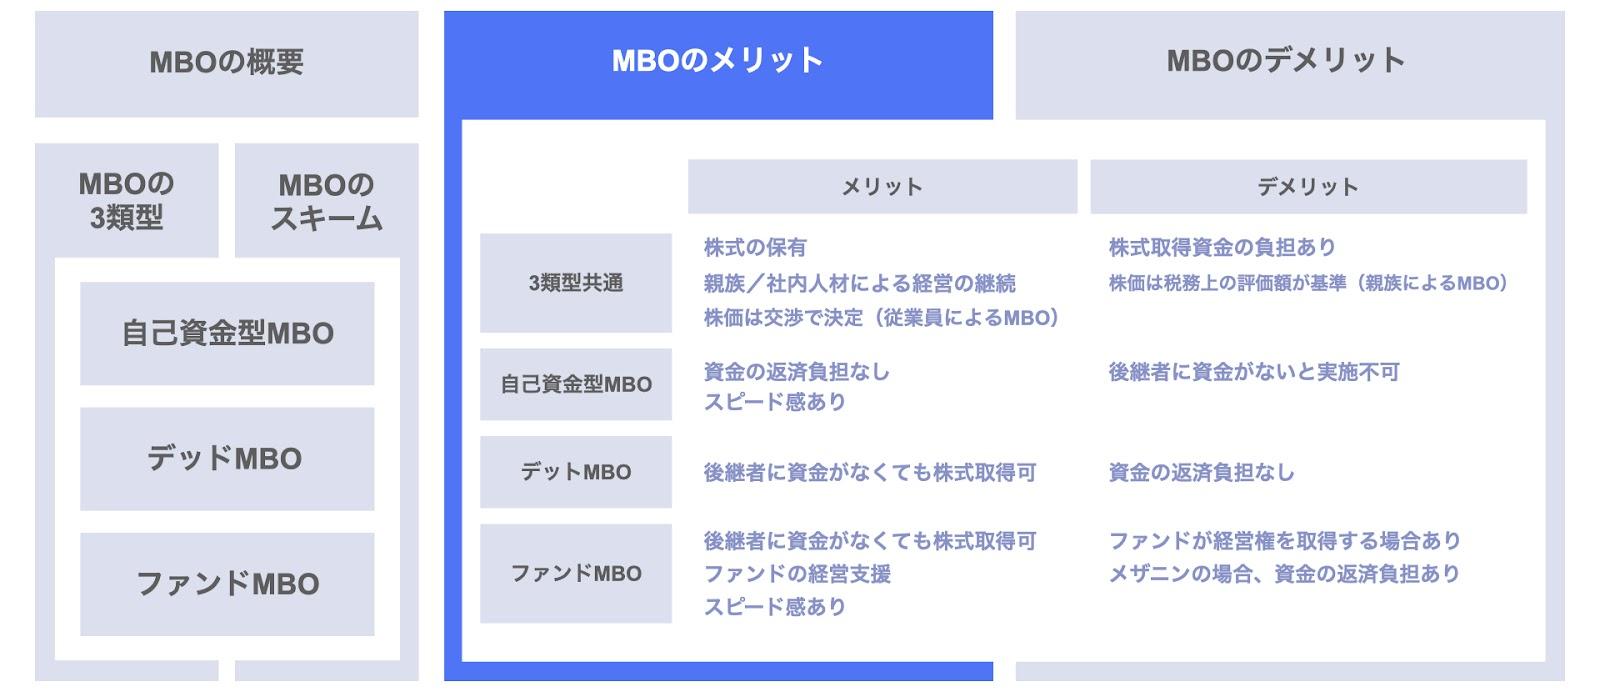 MBOのメリット